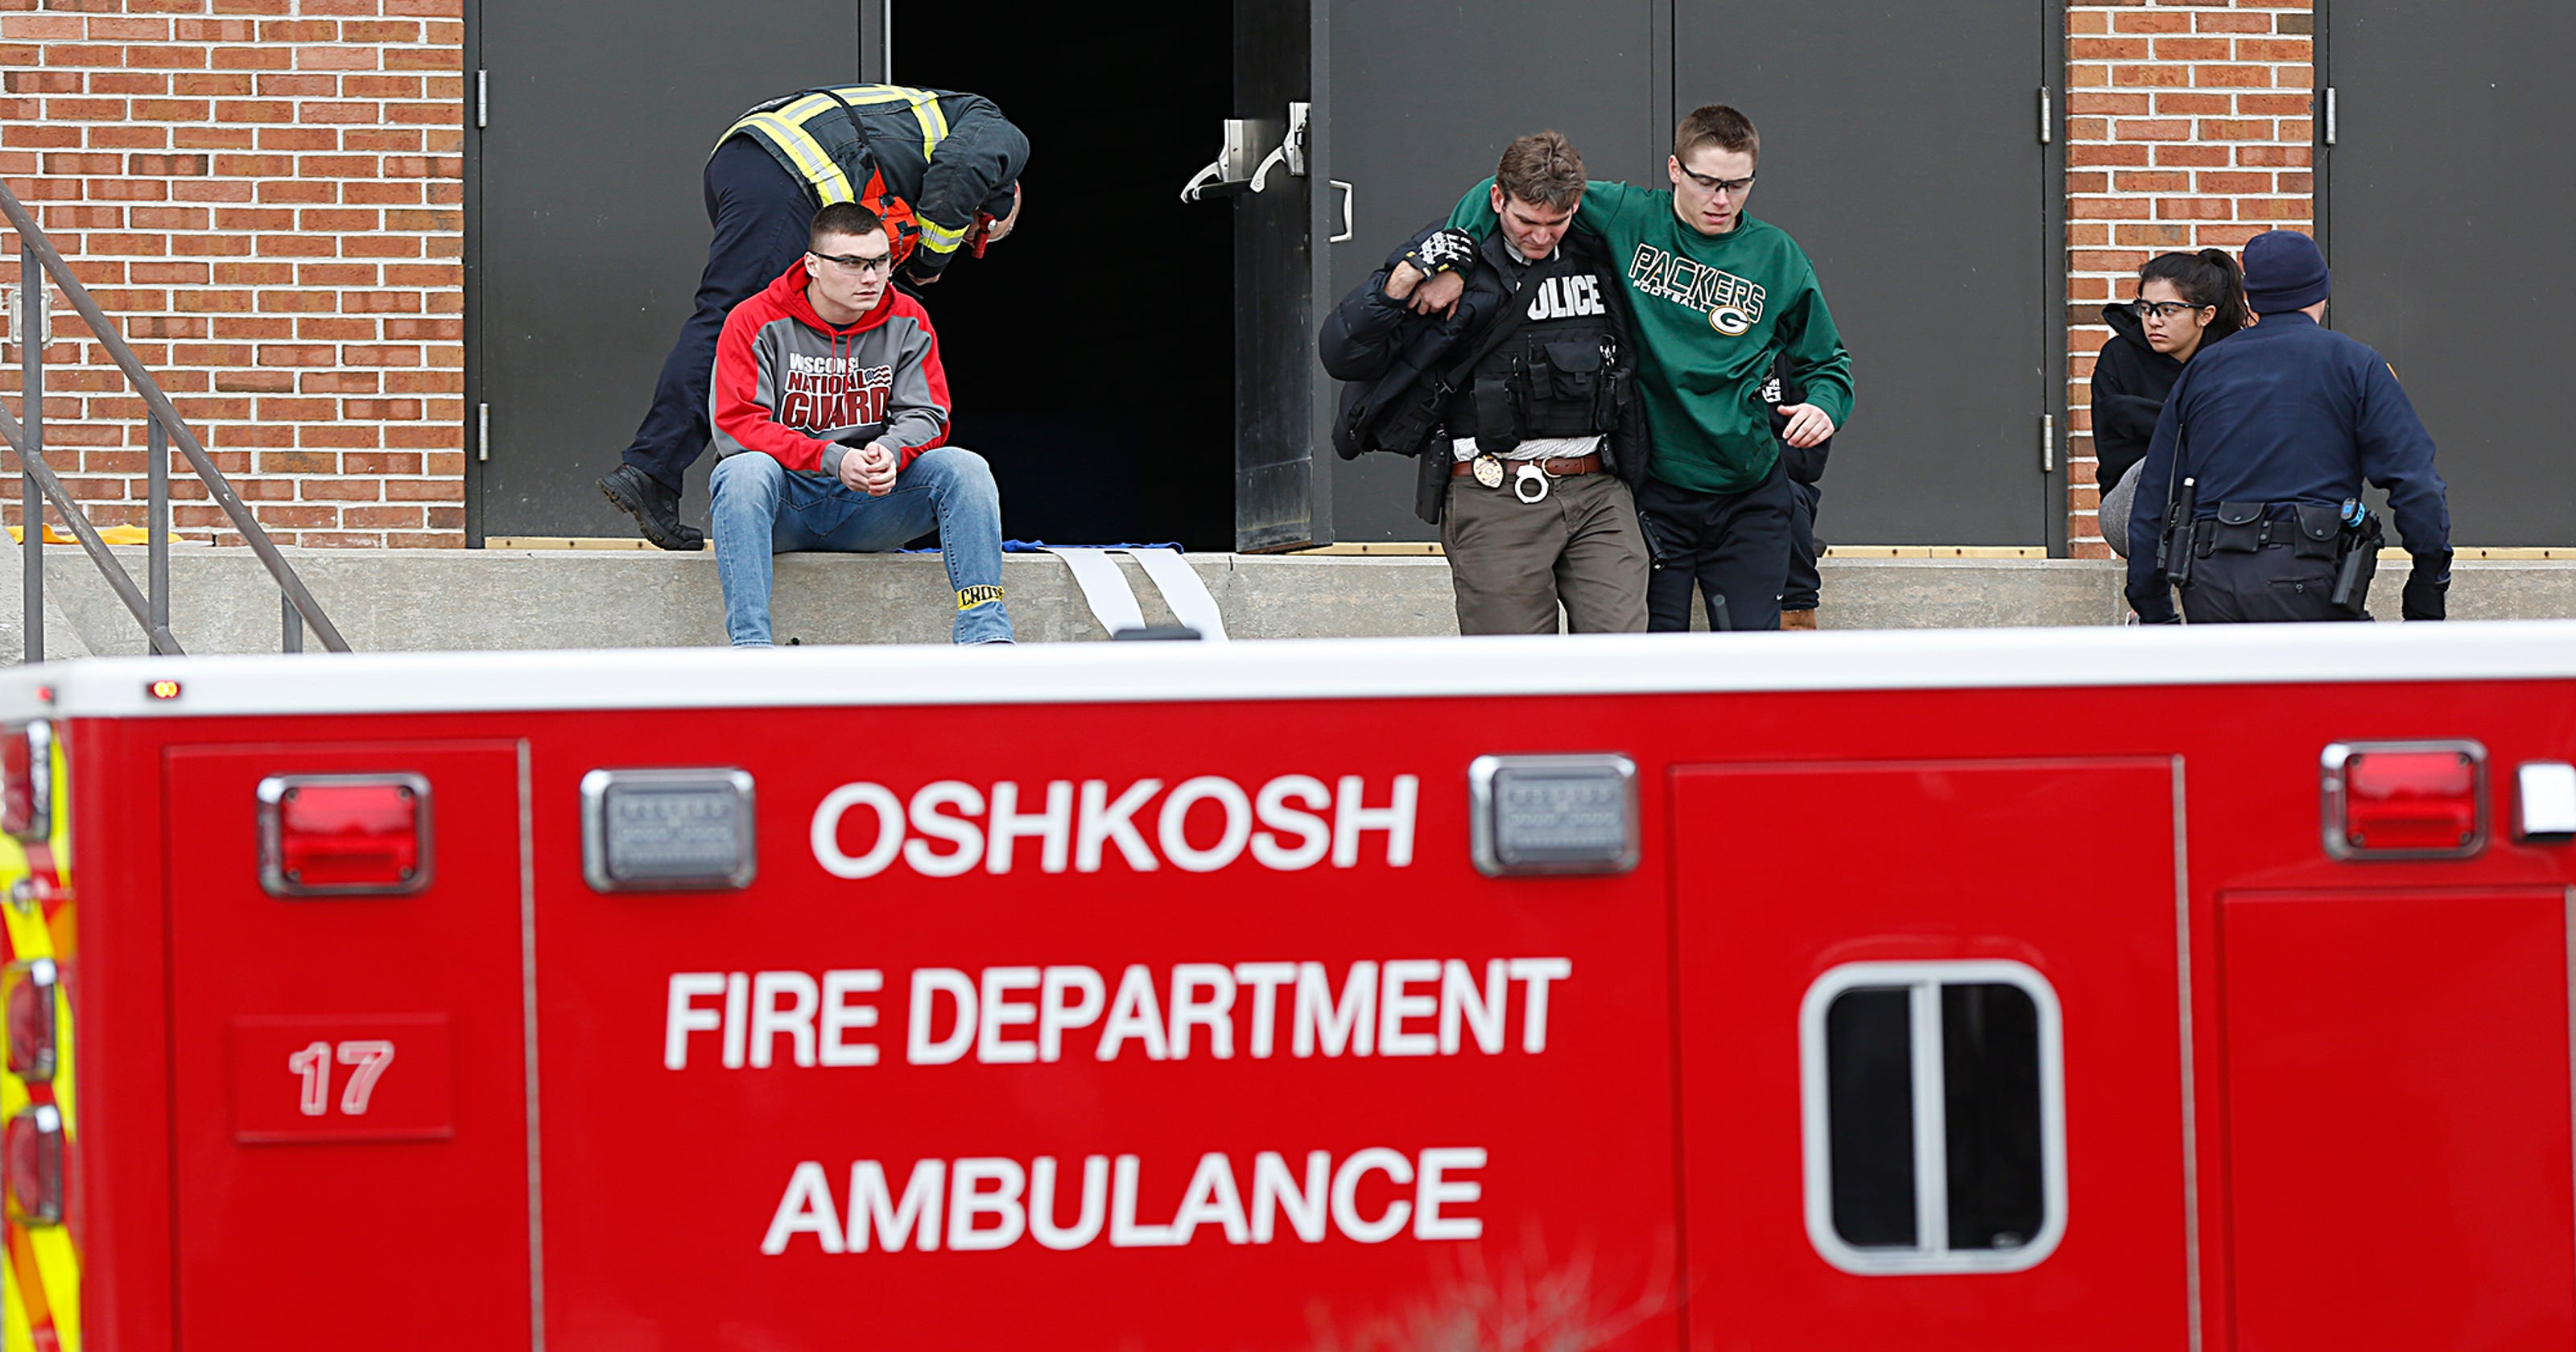 Oshkosh Fire Department to buy bulletproof vests for paramedics